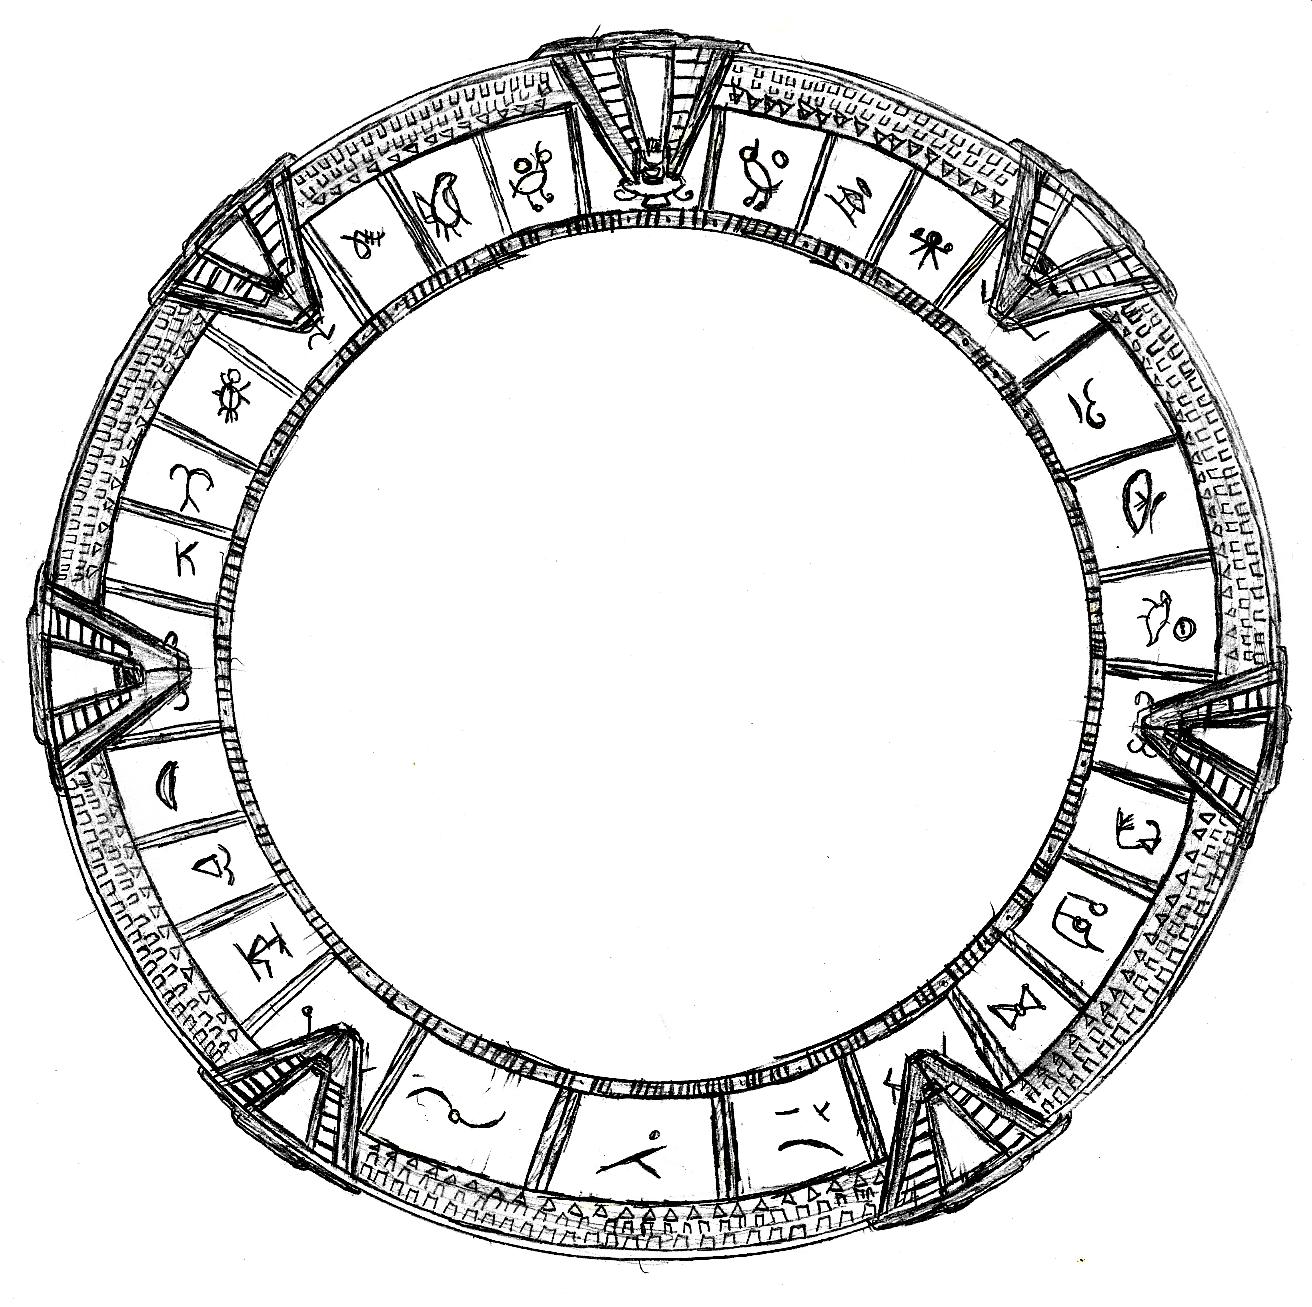 Stargate Sketch By Scarry On Deviantart